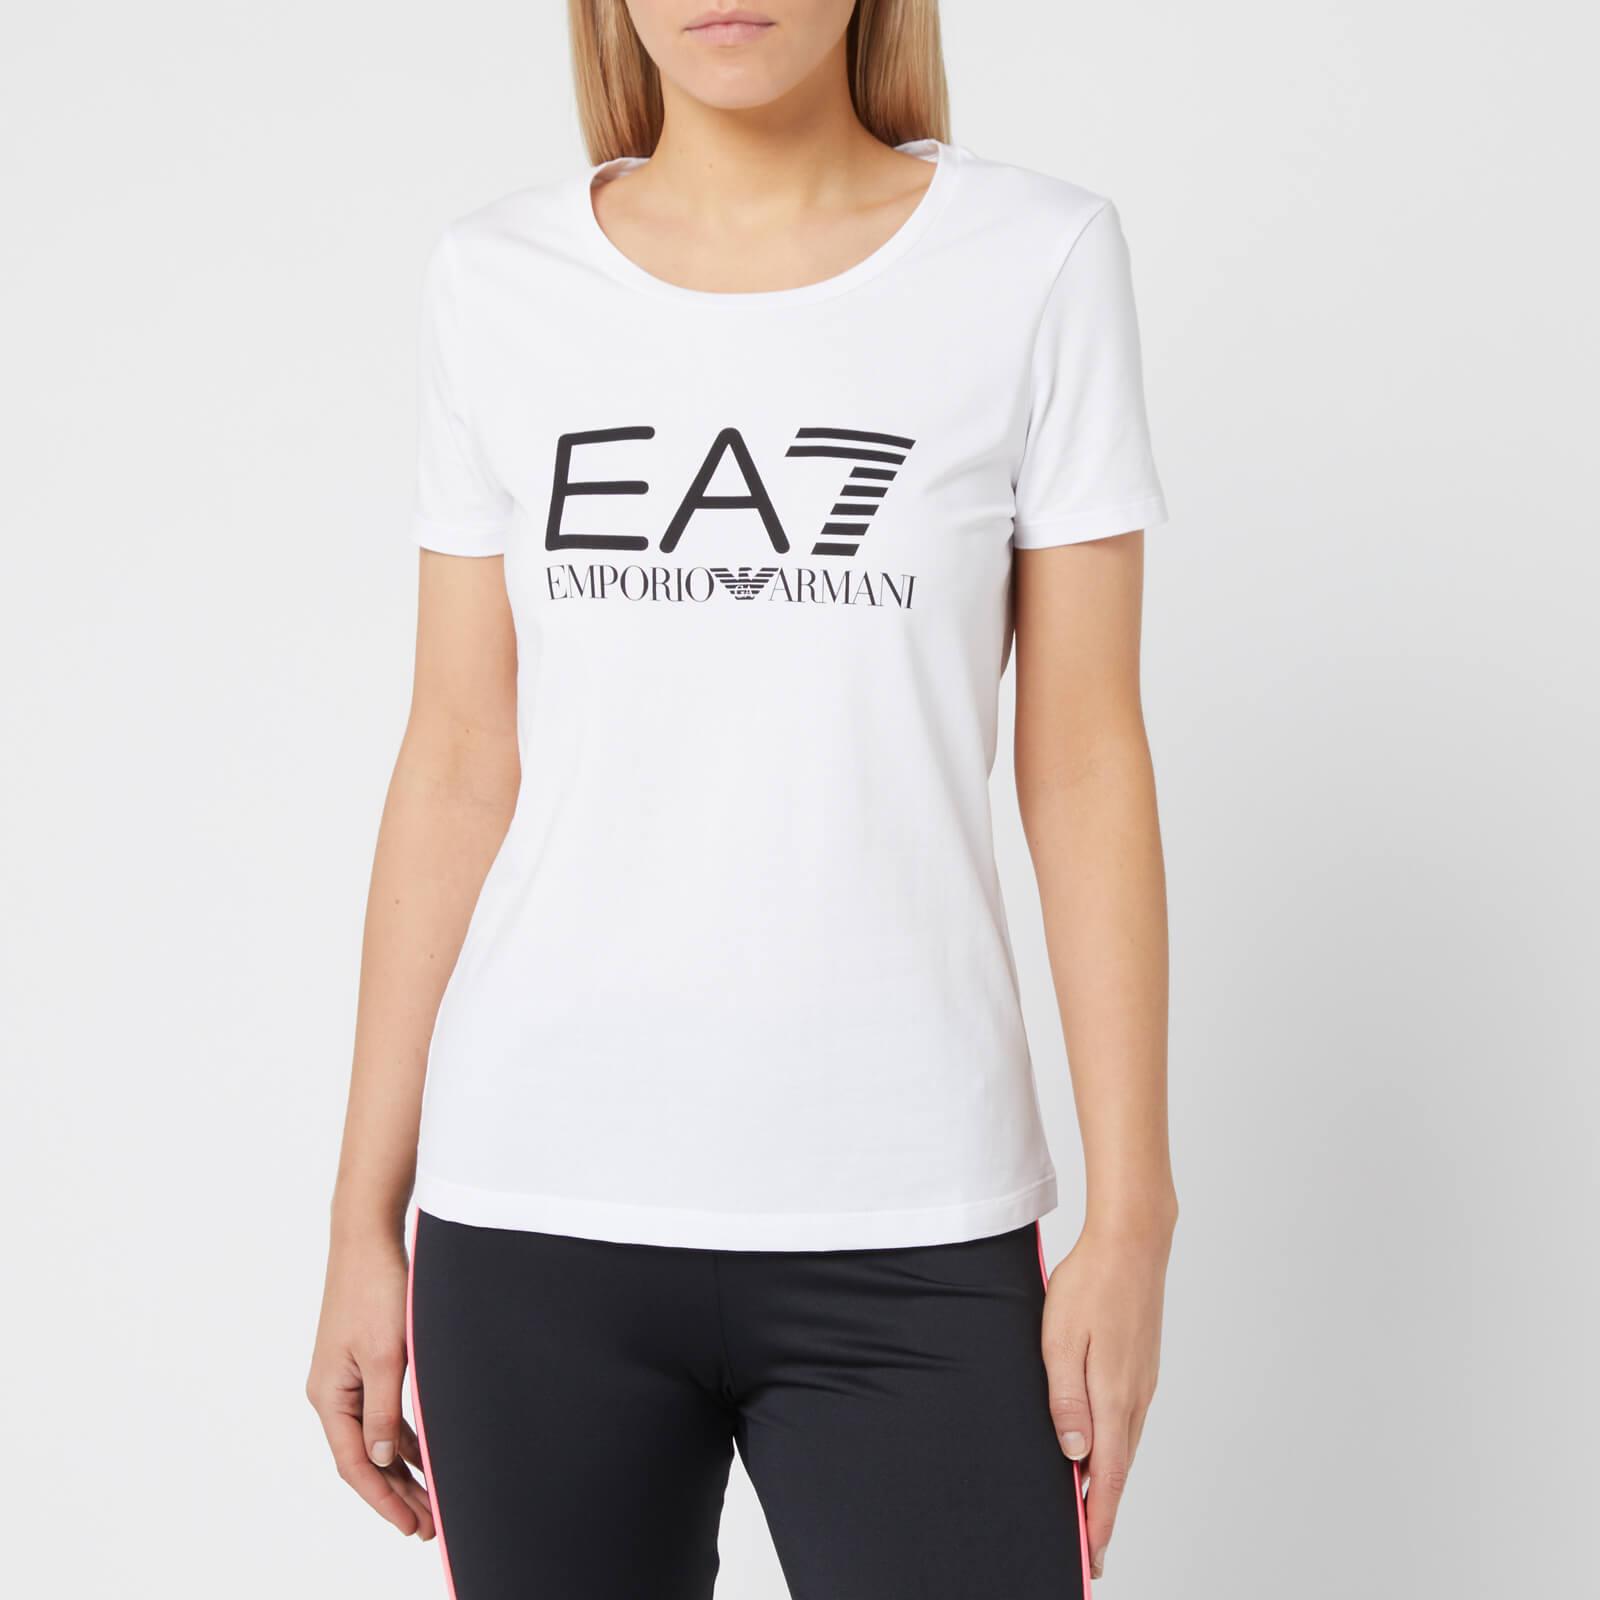 1617fc3acfc0 Emporio Armani EA7 Women's Train Logo Series Short Sleeve T-Shirt - White  Womens Clothing | TheHut.com